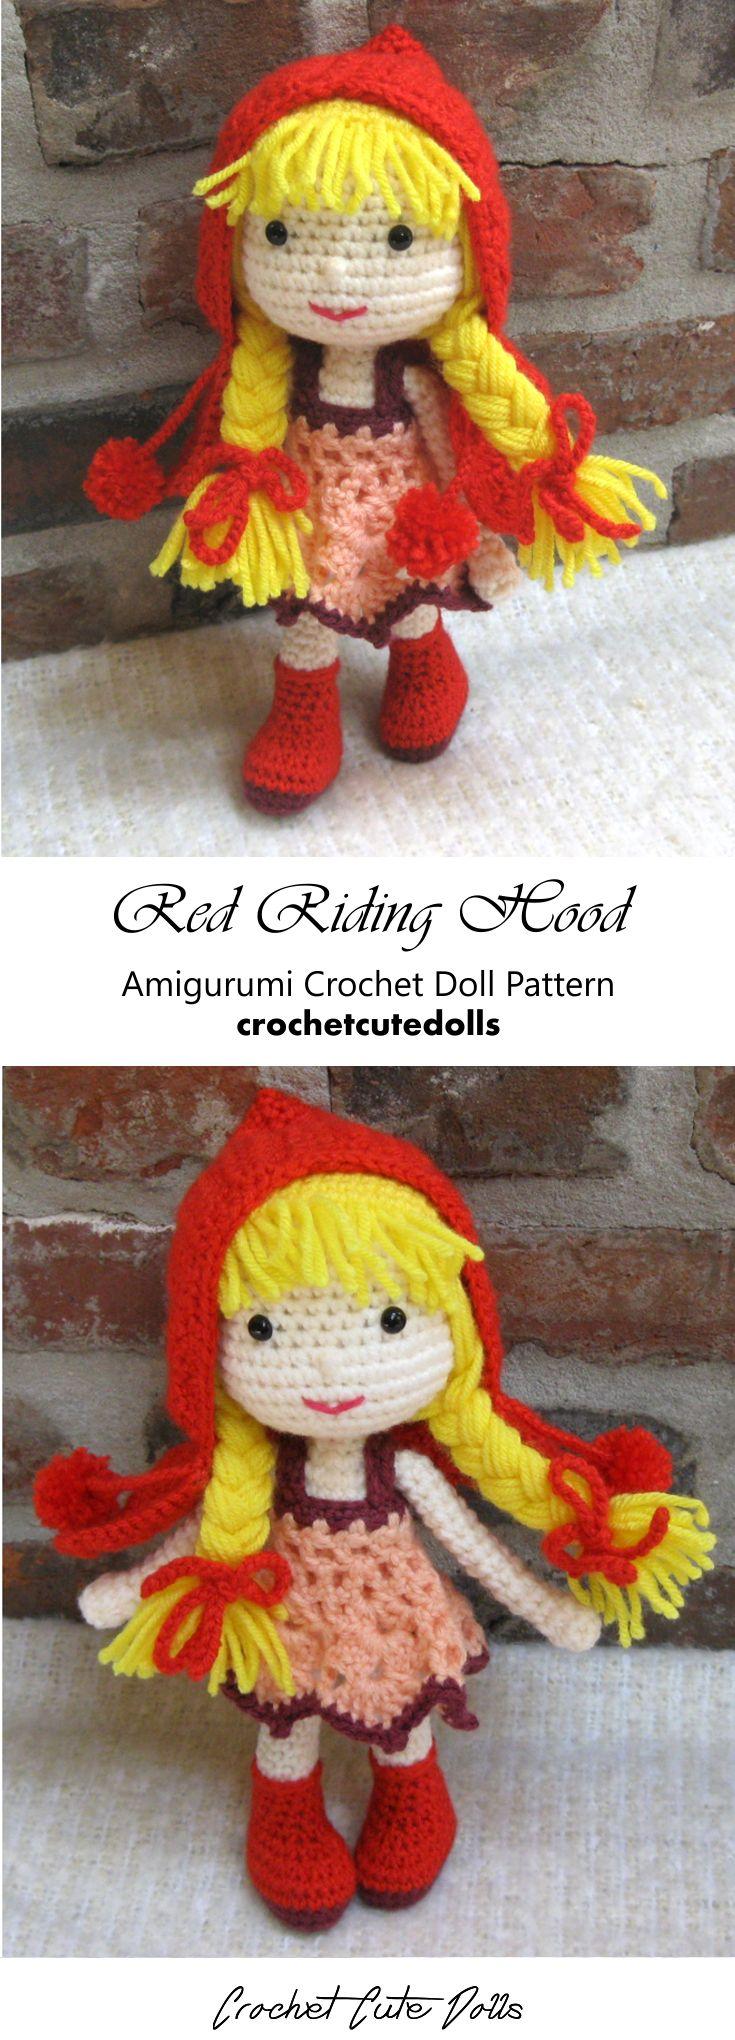 Amigurumi Crochet Doll Pattern & Tutorial for the cute Red Riding Hood doll by Crochet Cute Dolls